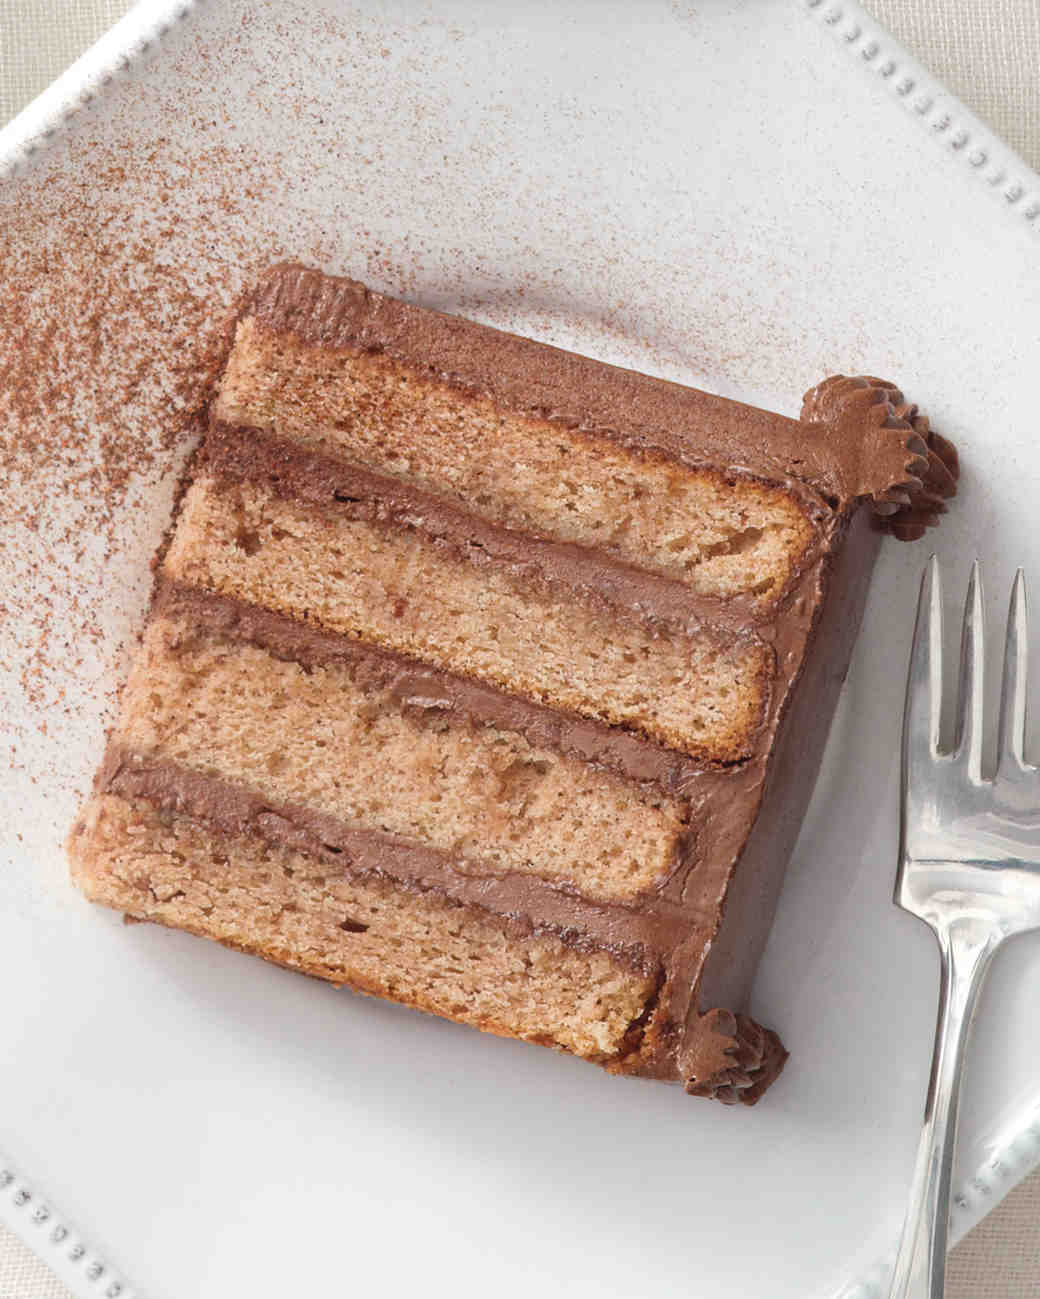 Spiced Chocolate Buttercream